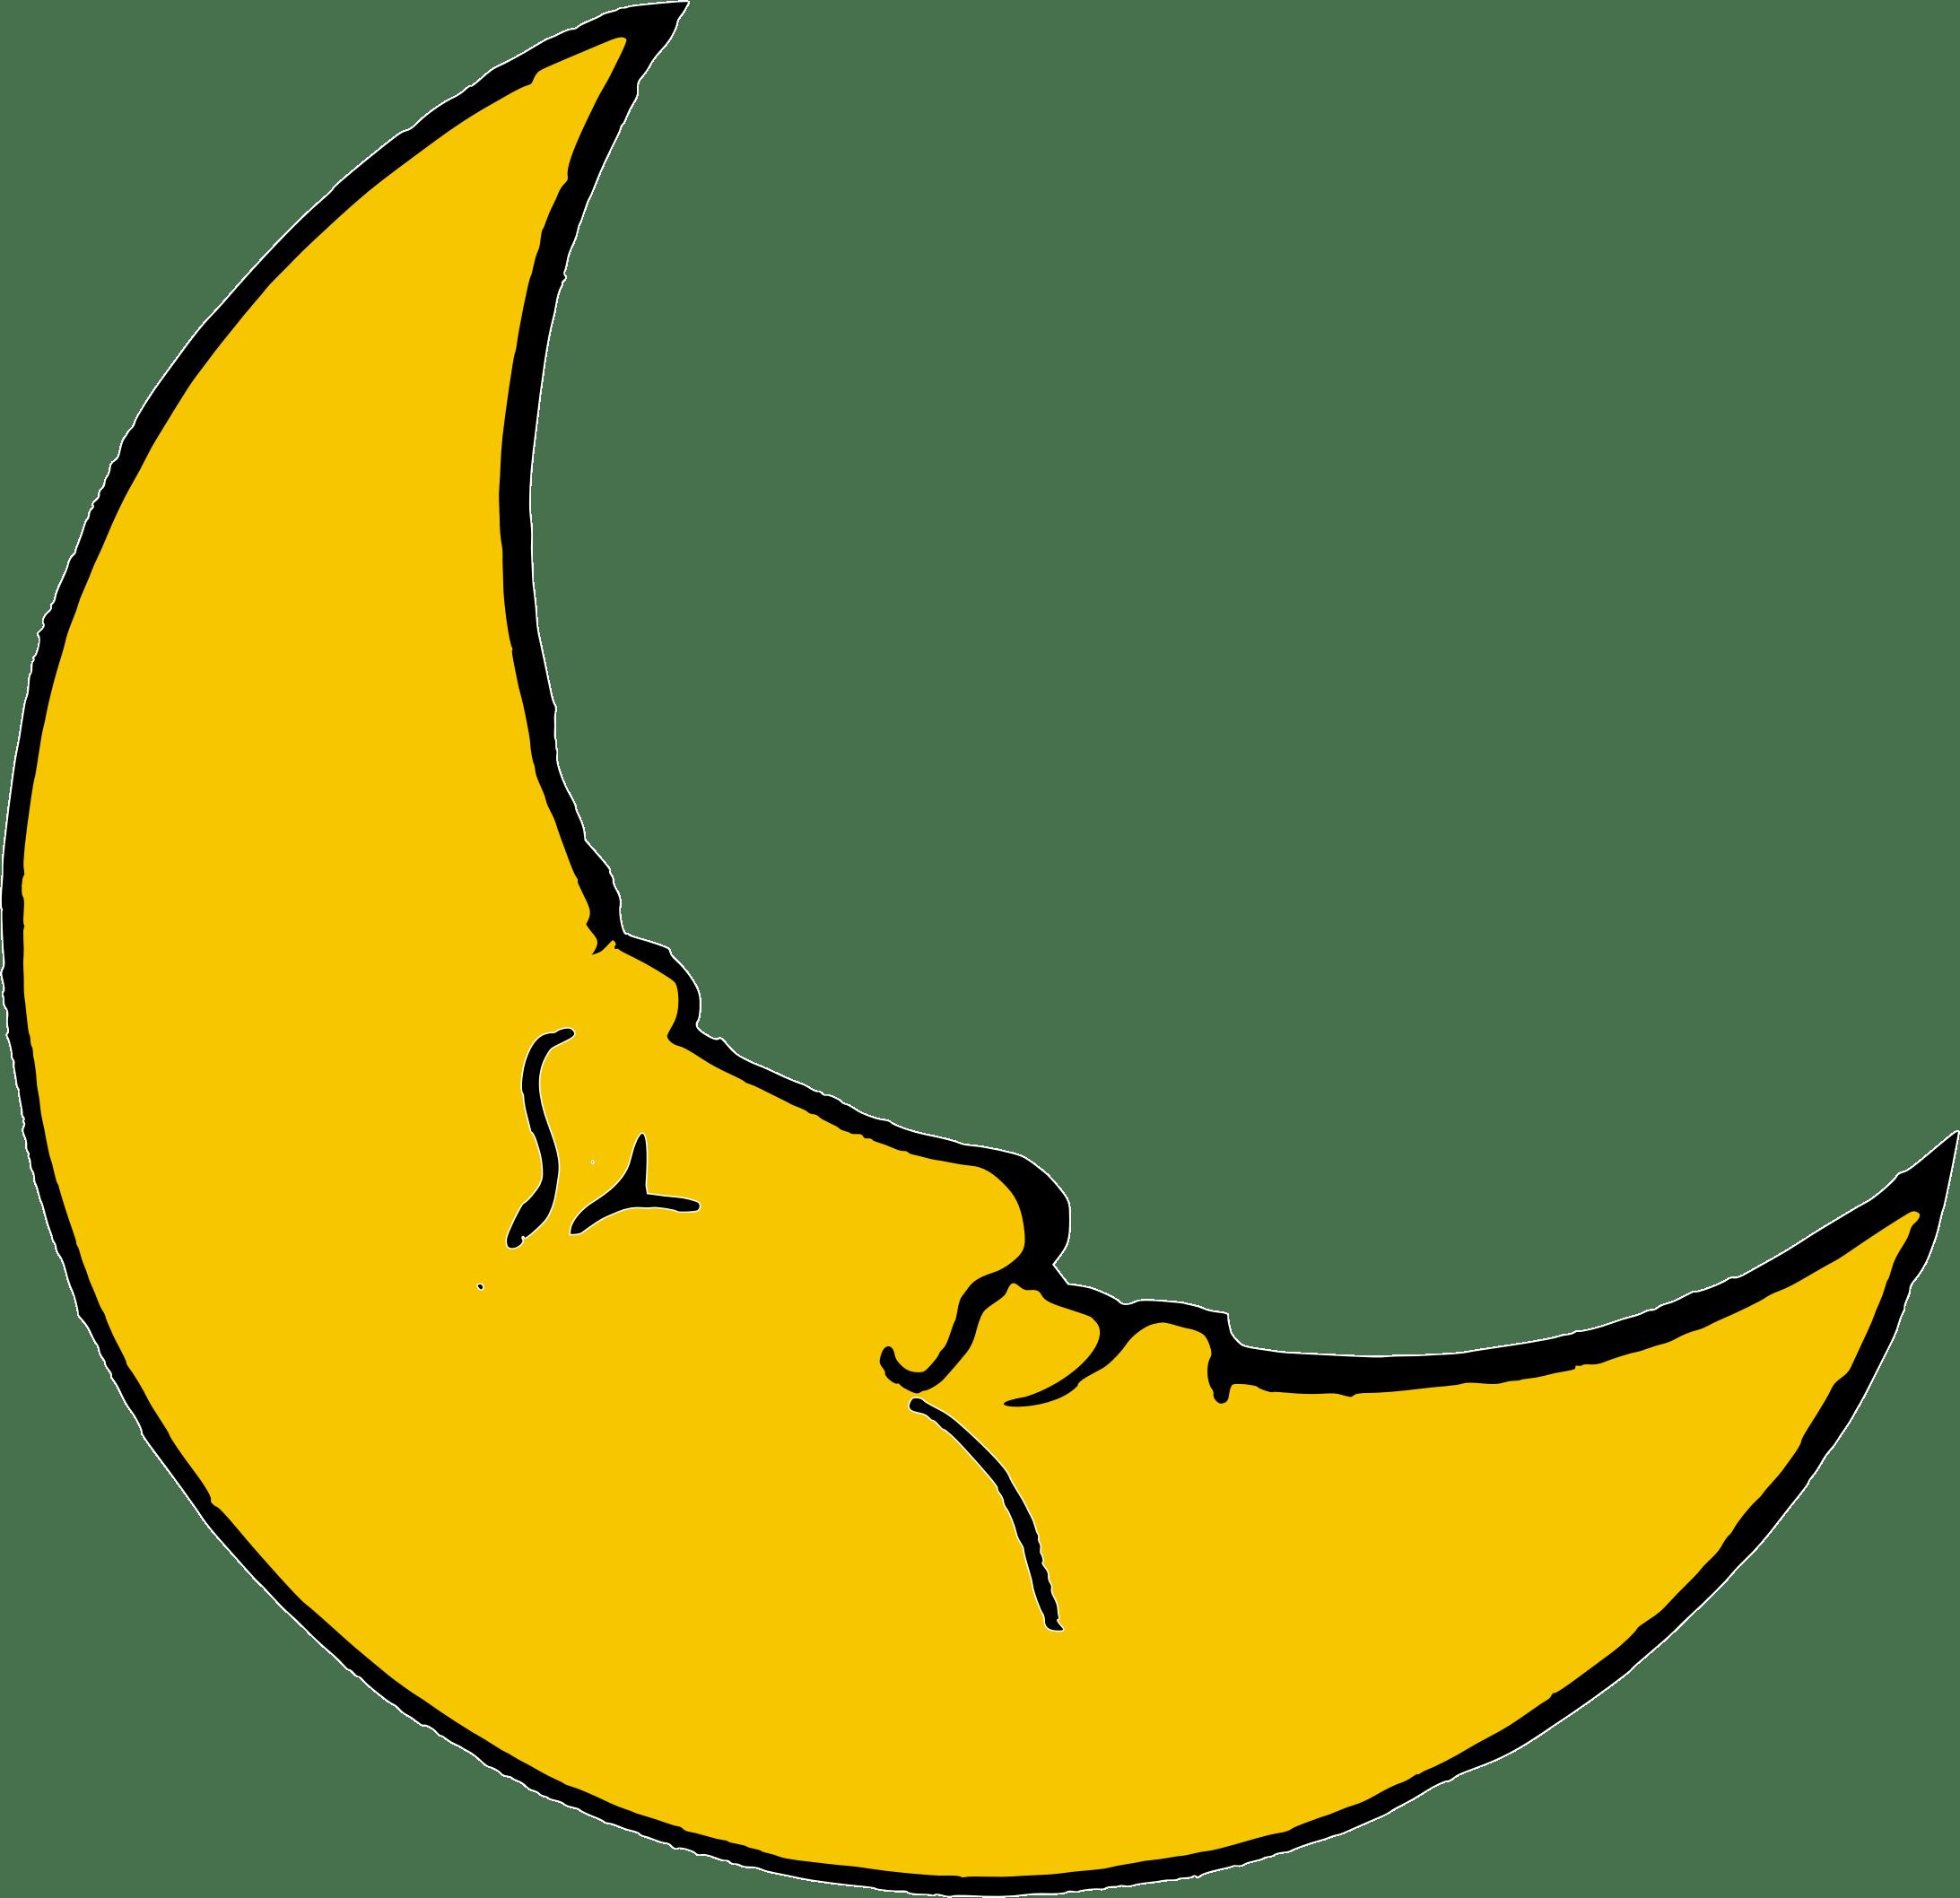 Smiling moon crescent transparent png stickpng smiling moon crescent buycottarizona Image collections